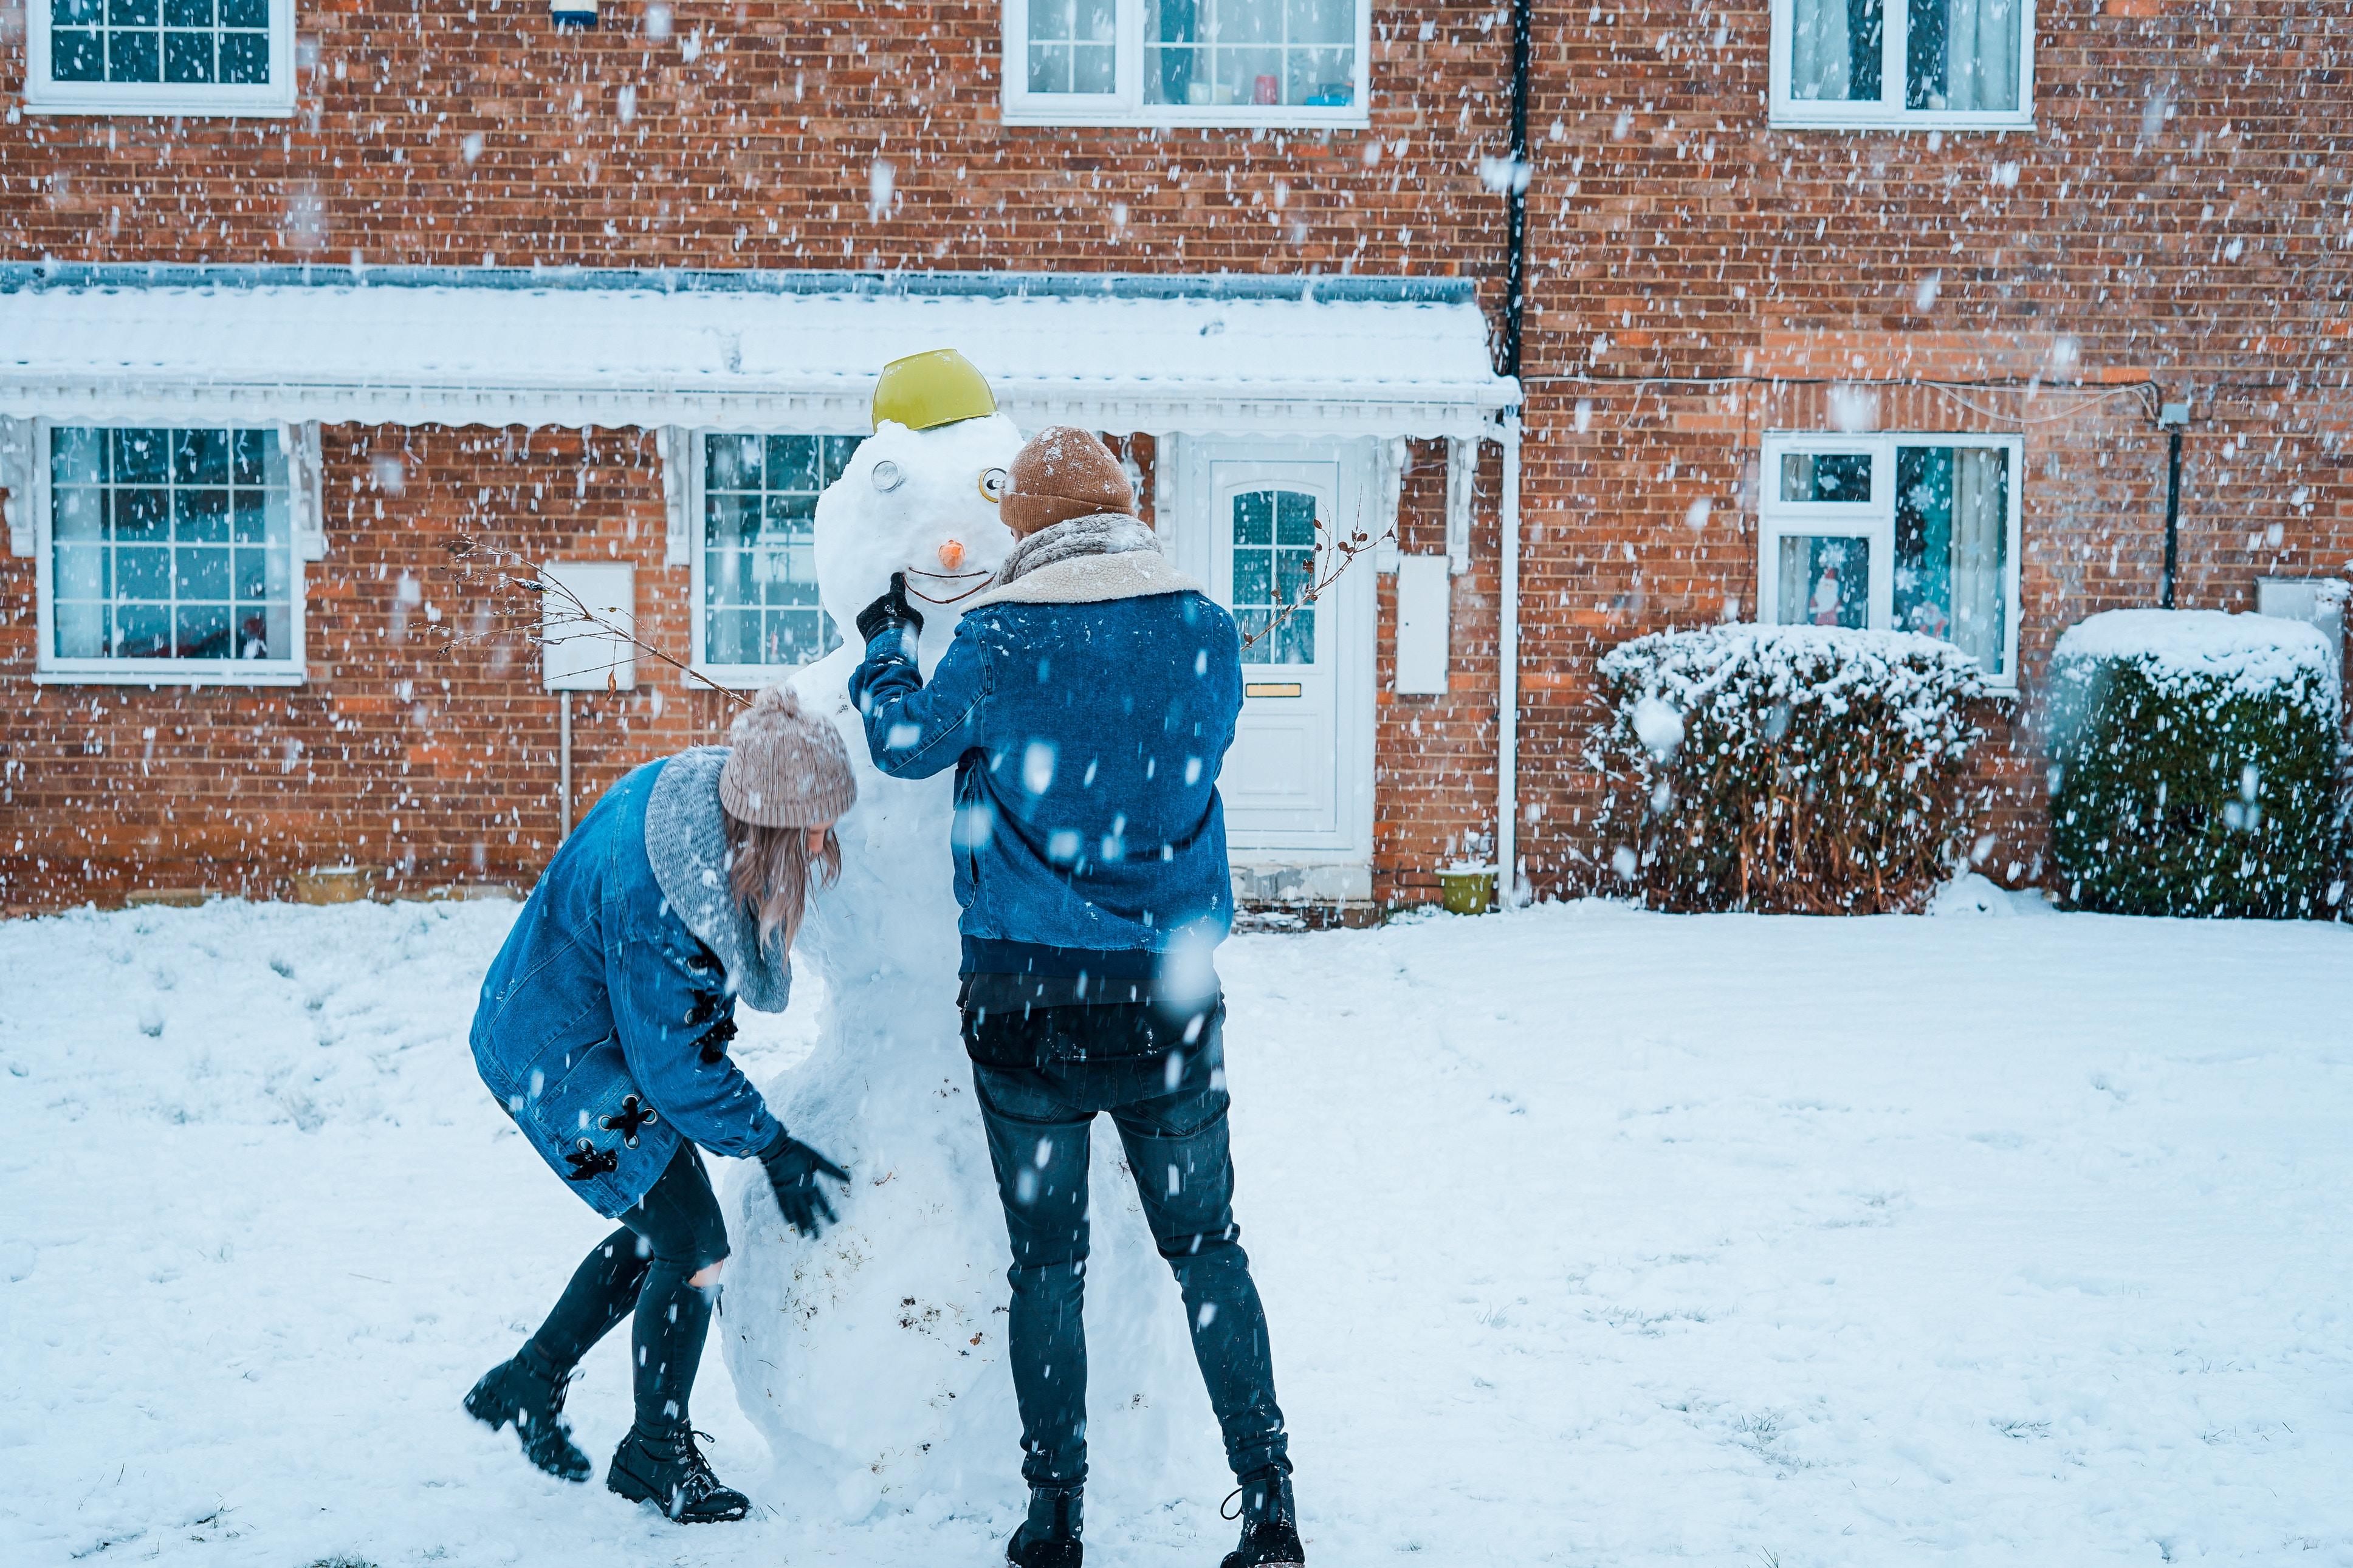 play-in-snow-toa-heftiba-1224206-unsplash